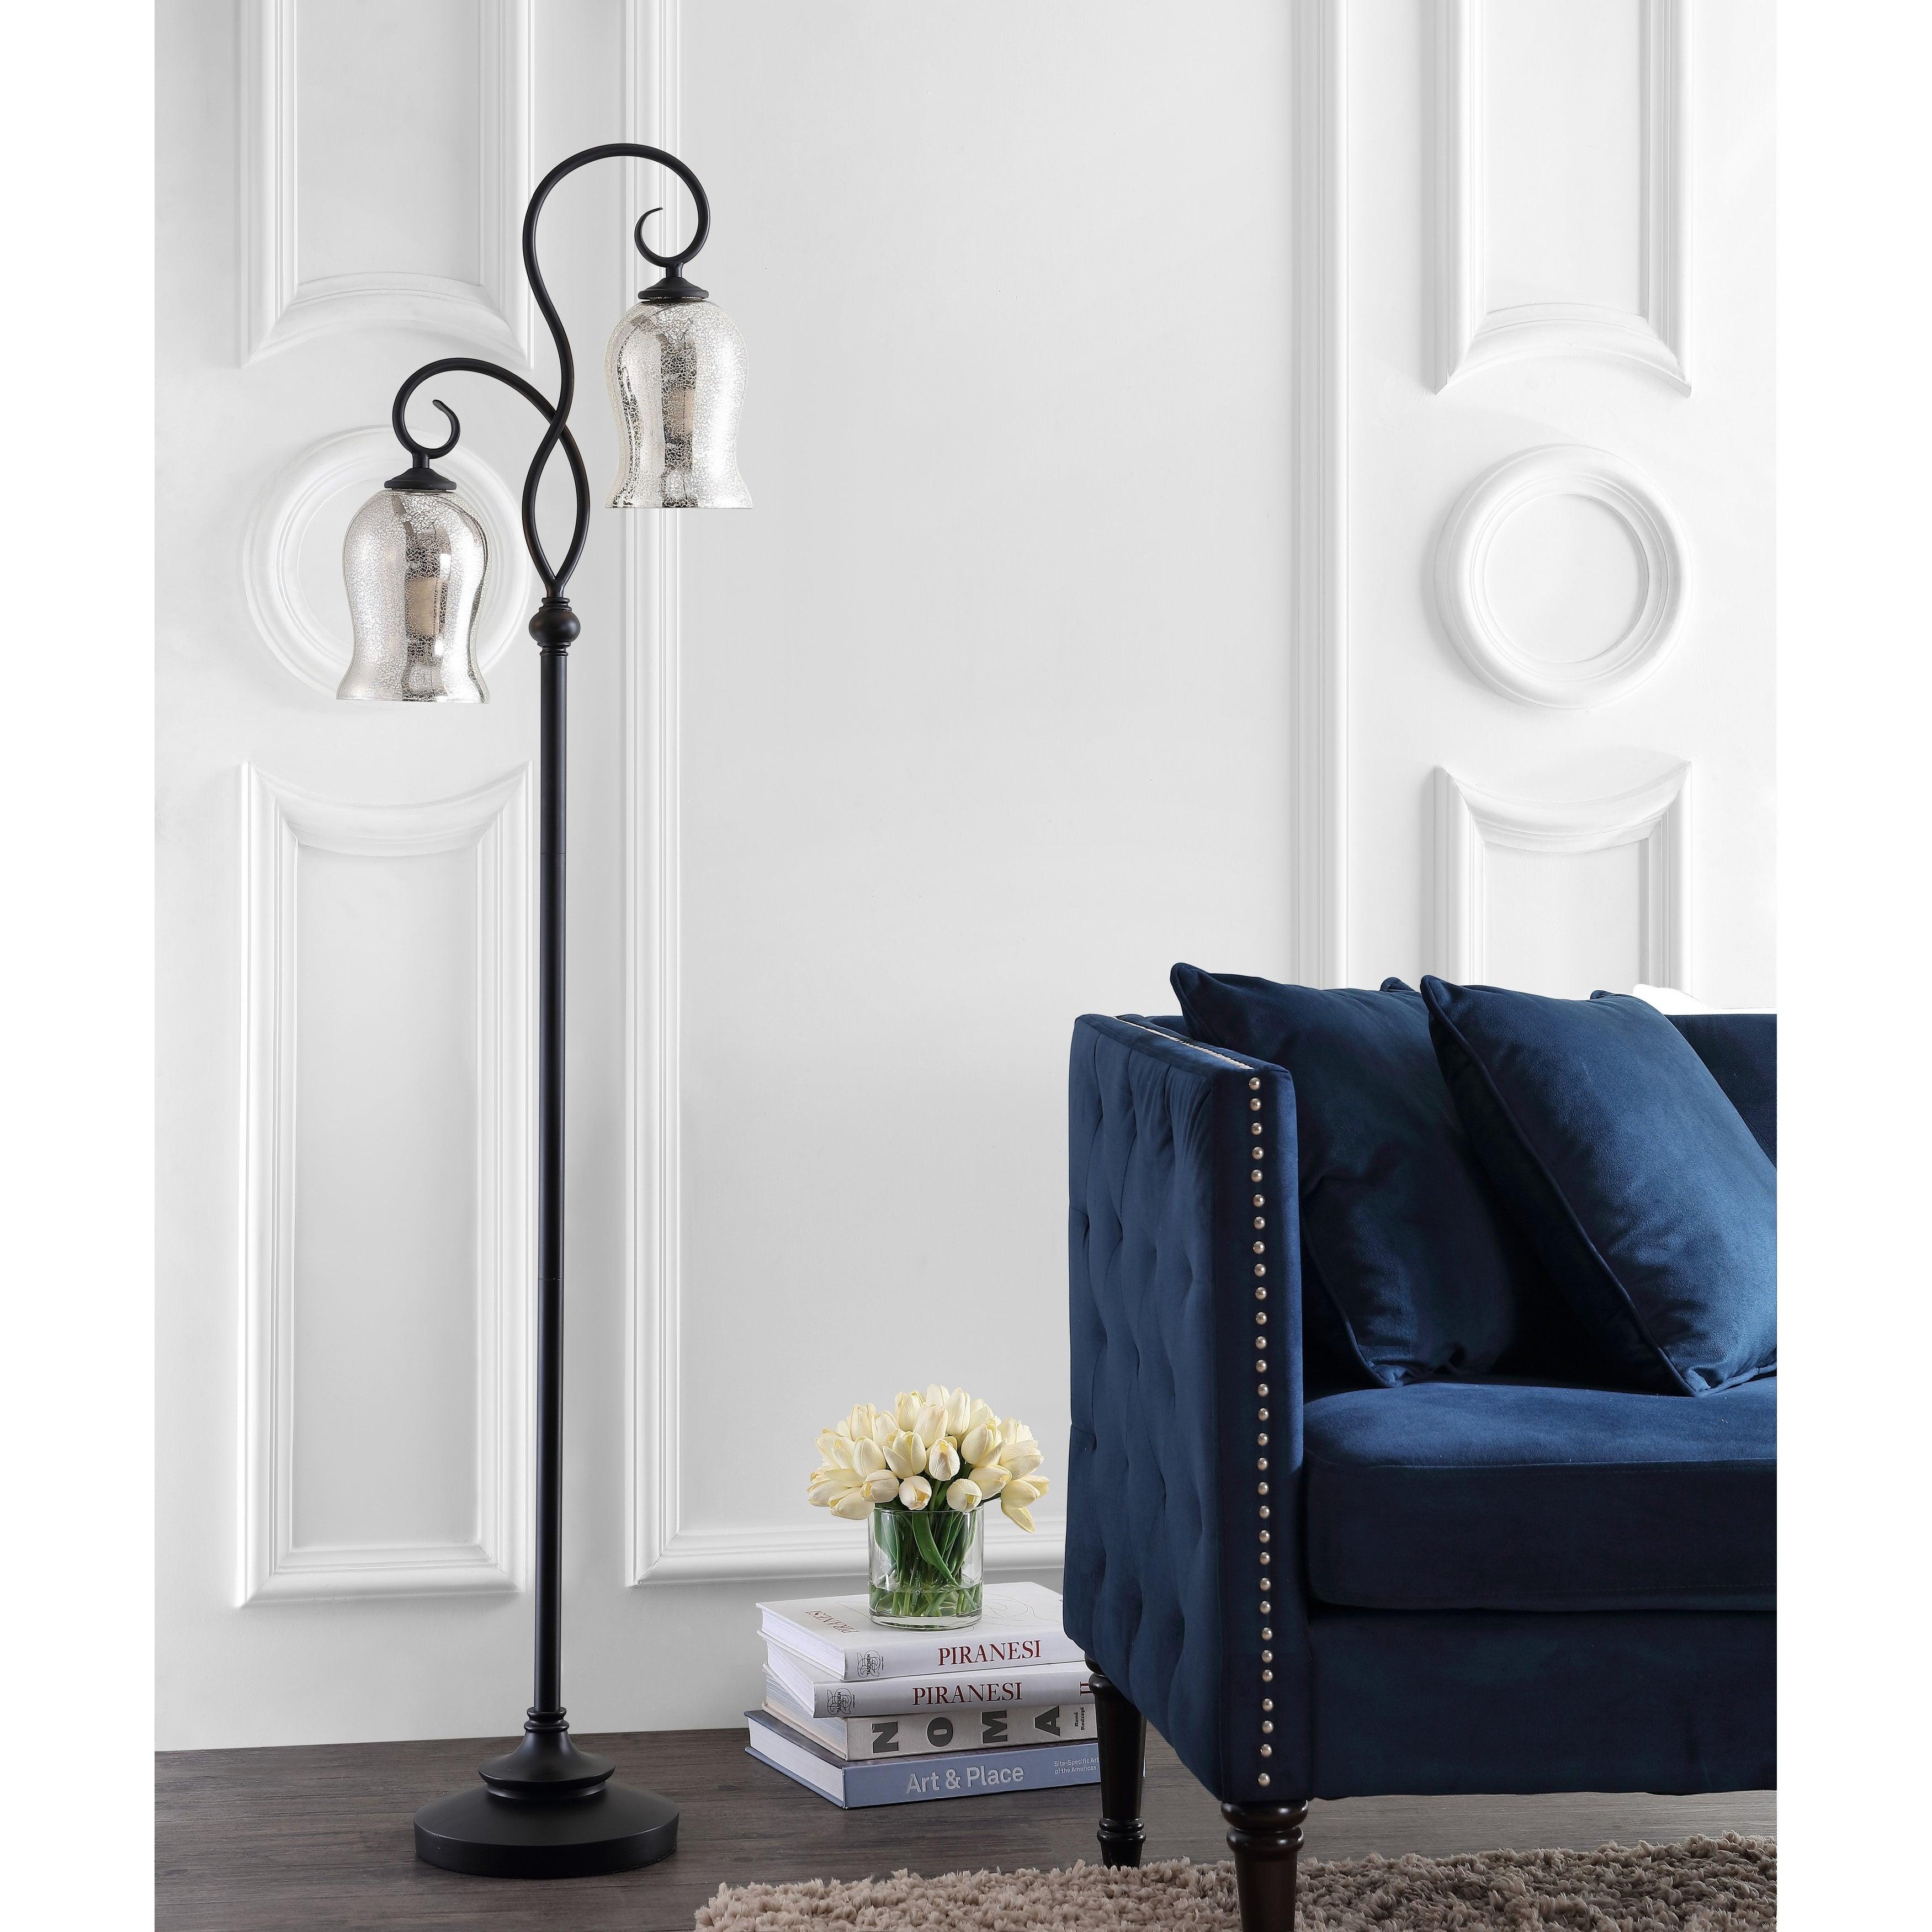 Safavieh Lighting 64 Inch Claudia Black Led Floor Lamp 16 X 9 8 X 63 5 On Sale Overstock 27123791